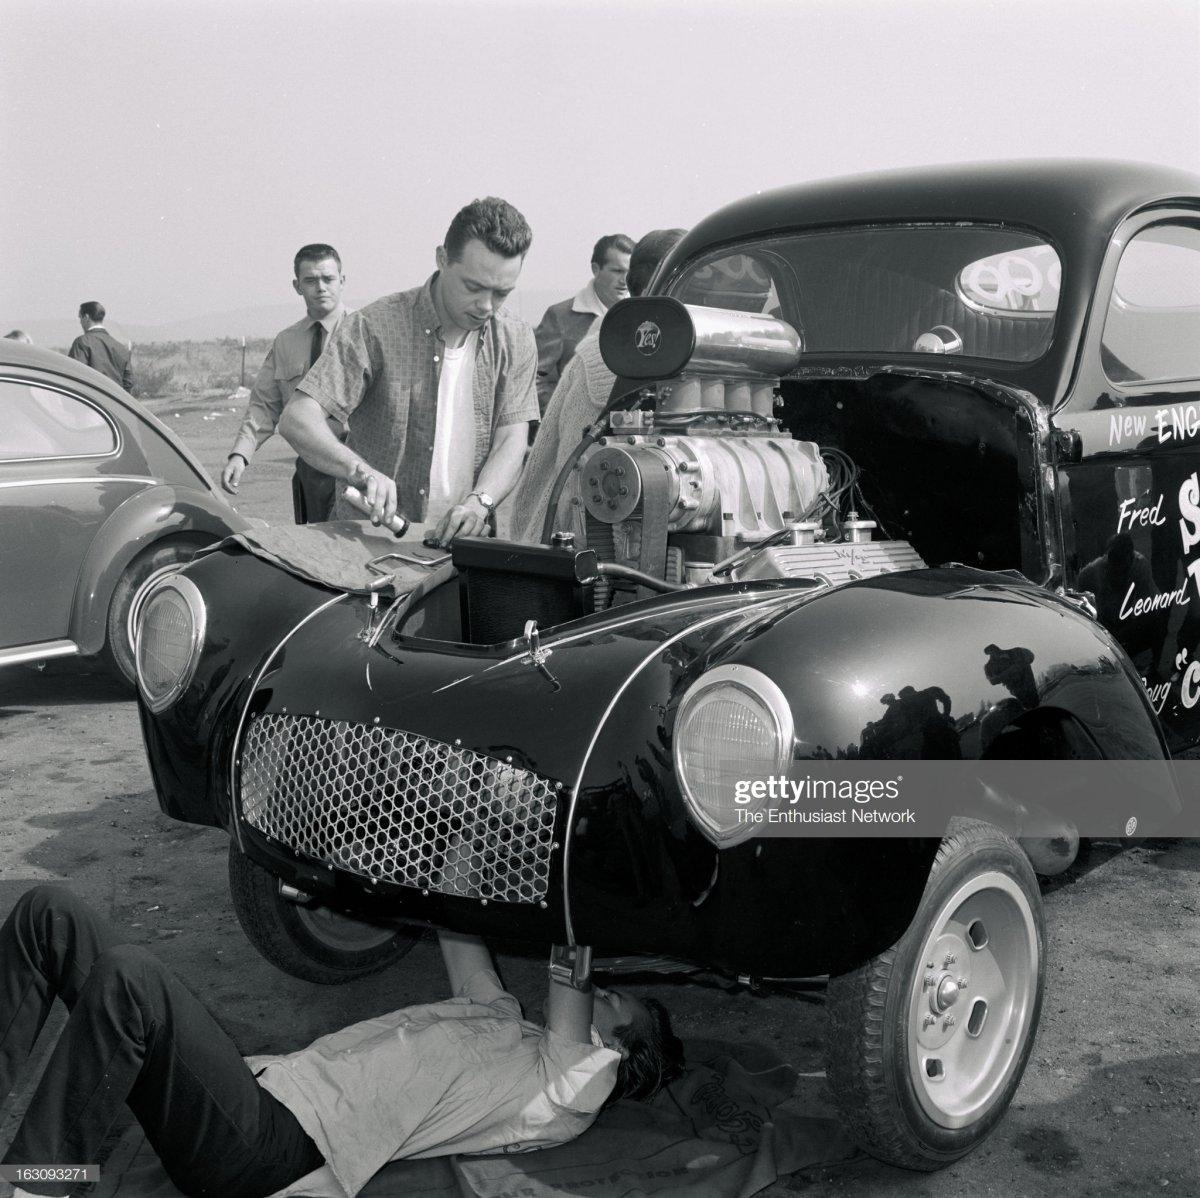 1965 Mickey Thompson Drag Race - Fontana Drag City SWC.jpg